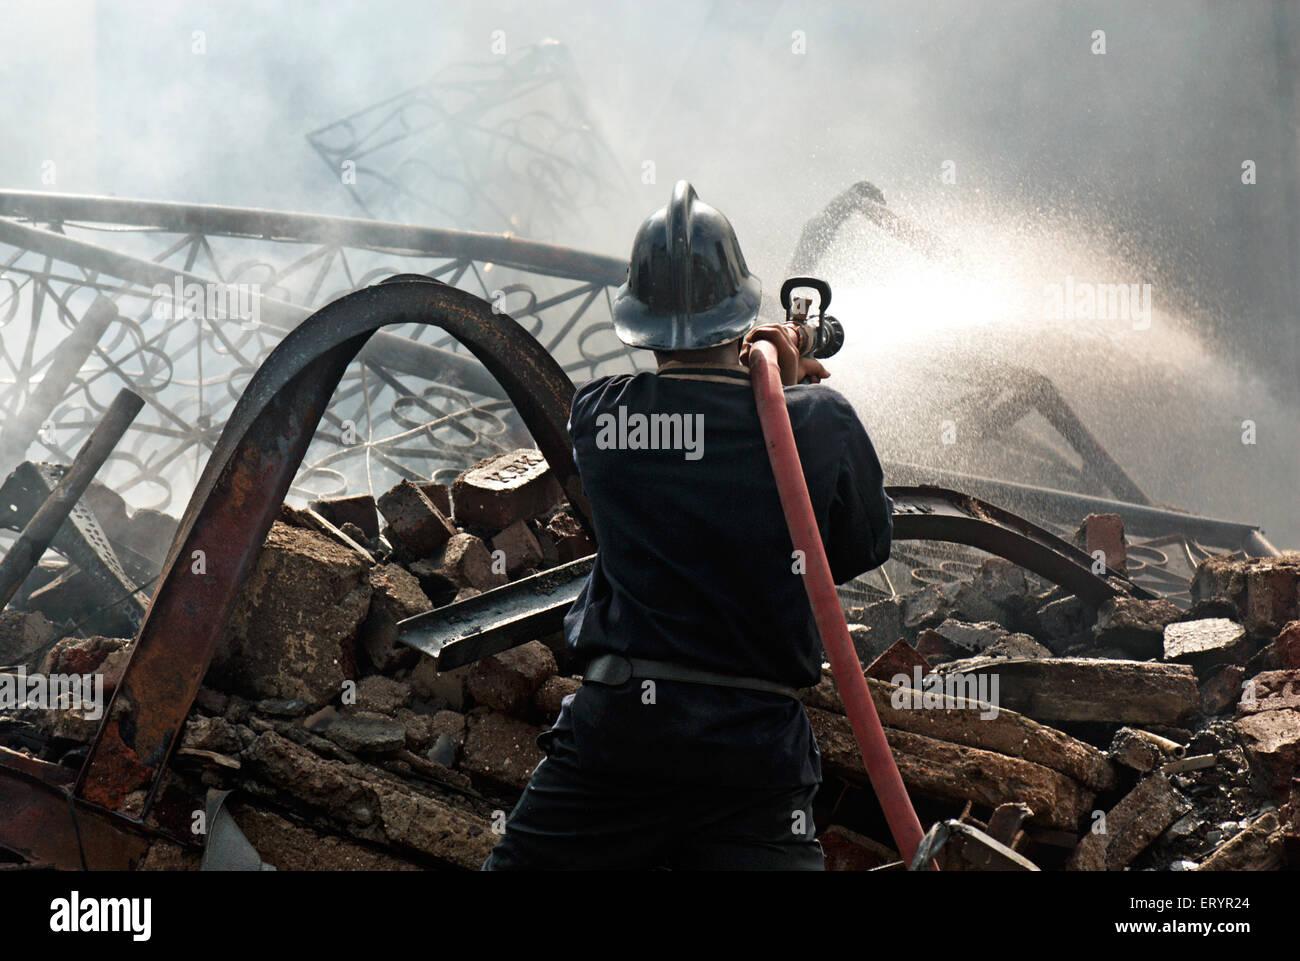 Firefighter spegnimento incendio in baraccopoli Behrampada ; Bandra ; Mumbai Bombay ; Maharashtra ; India 18 Giugno Immagini Stock